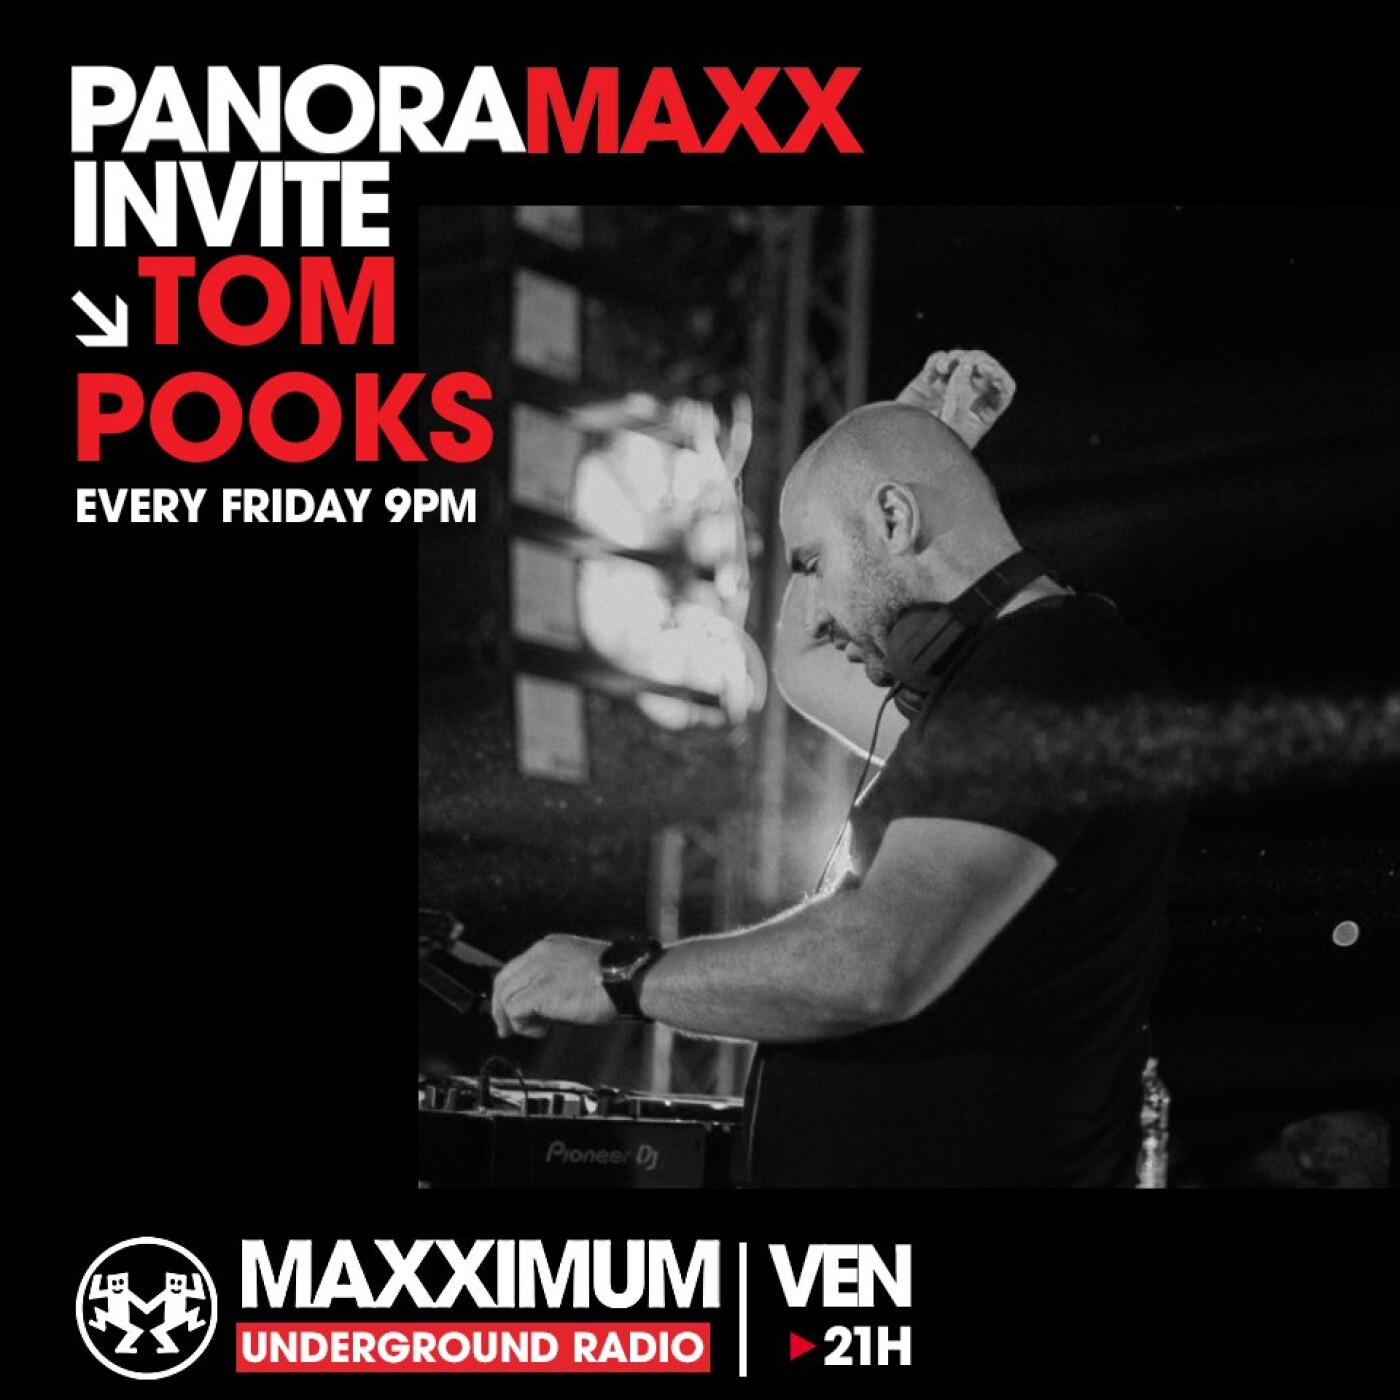 PANORAMAXX : TOM POOKS